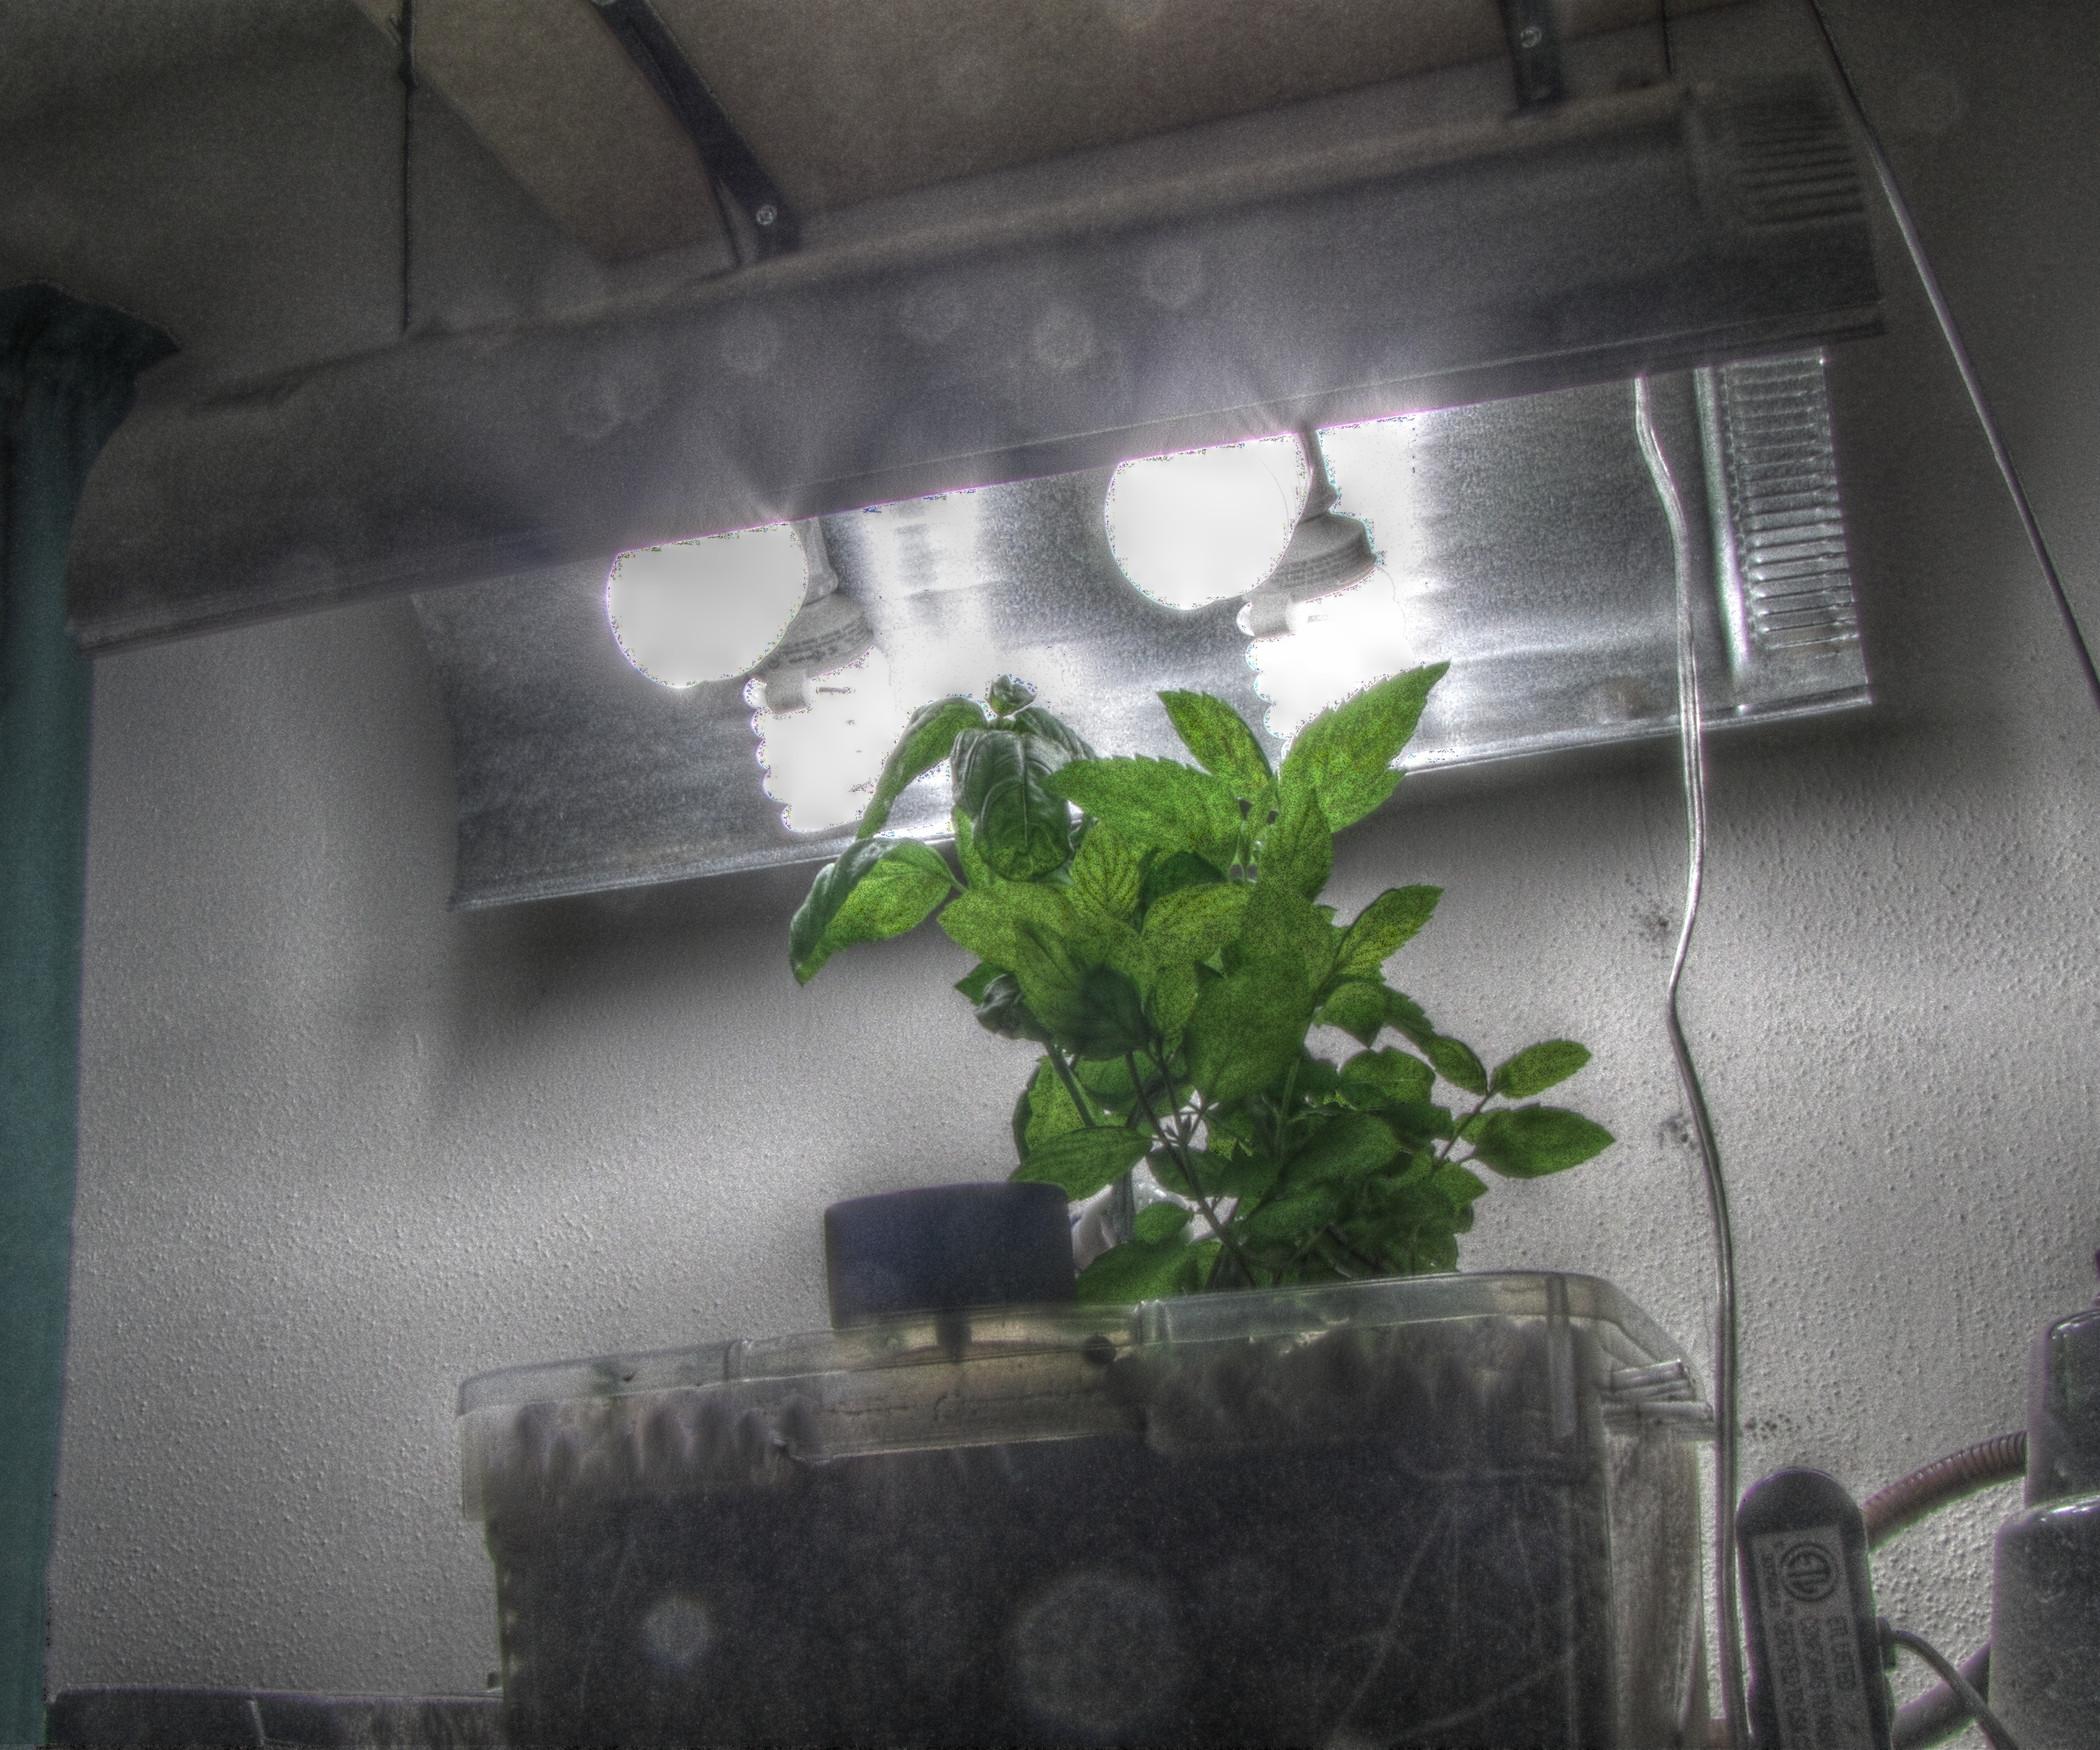 Best ideas about DIY Cfl Grow Light . Save or Pin Cheap DIY CFL Grow Light Now.